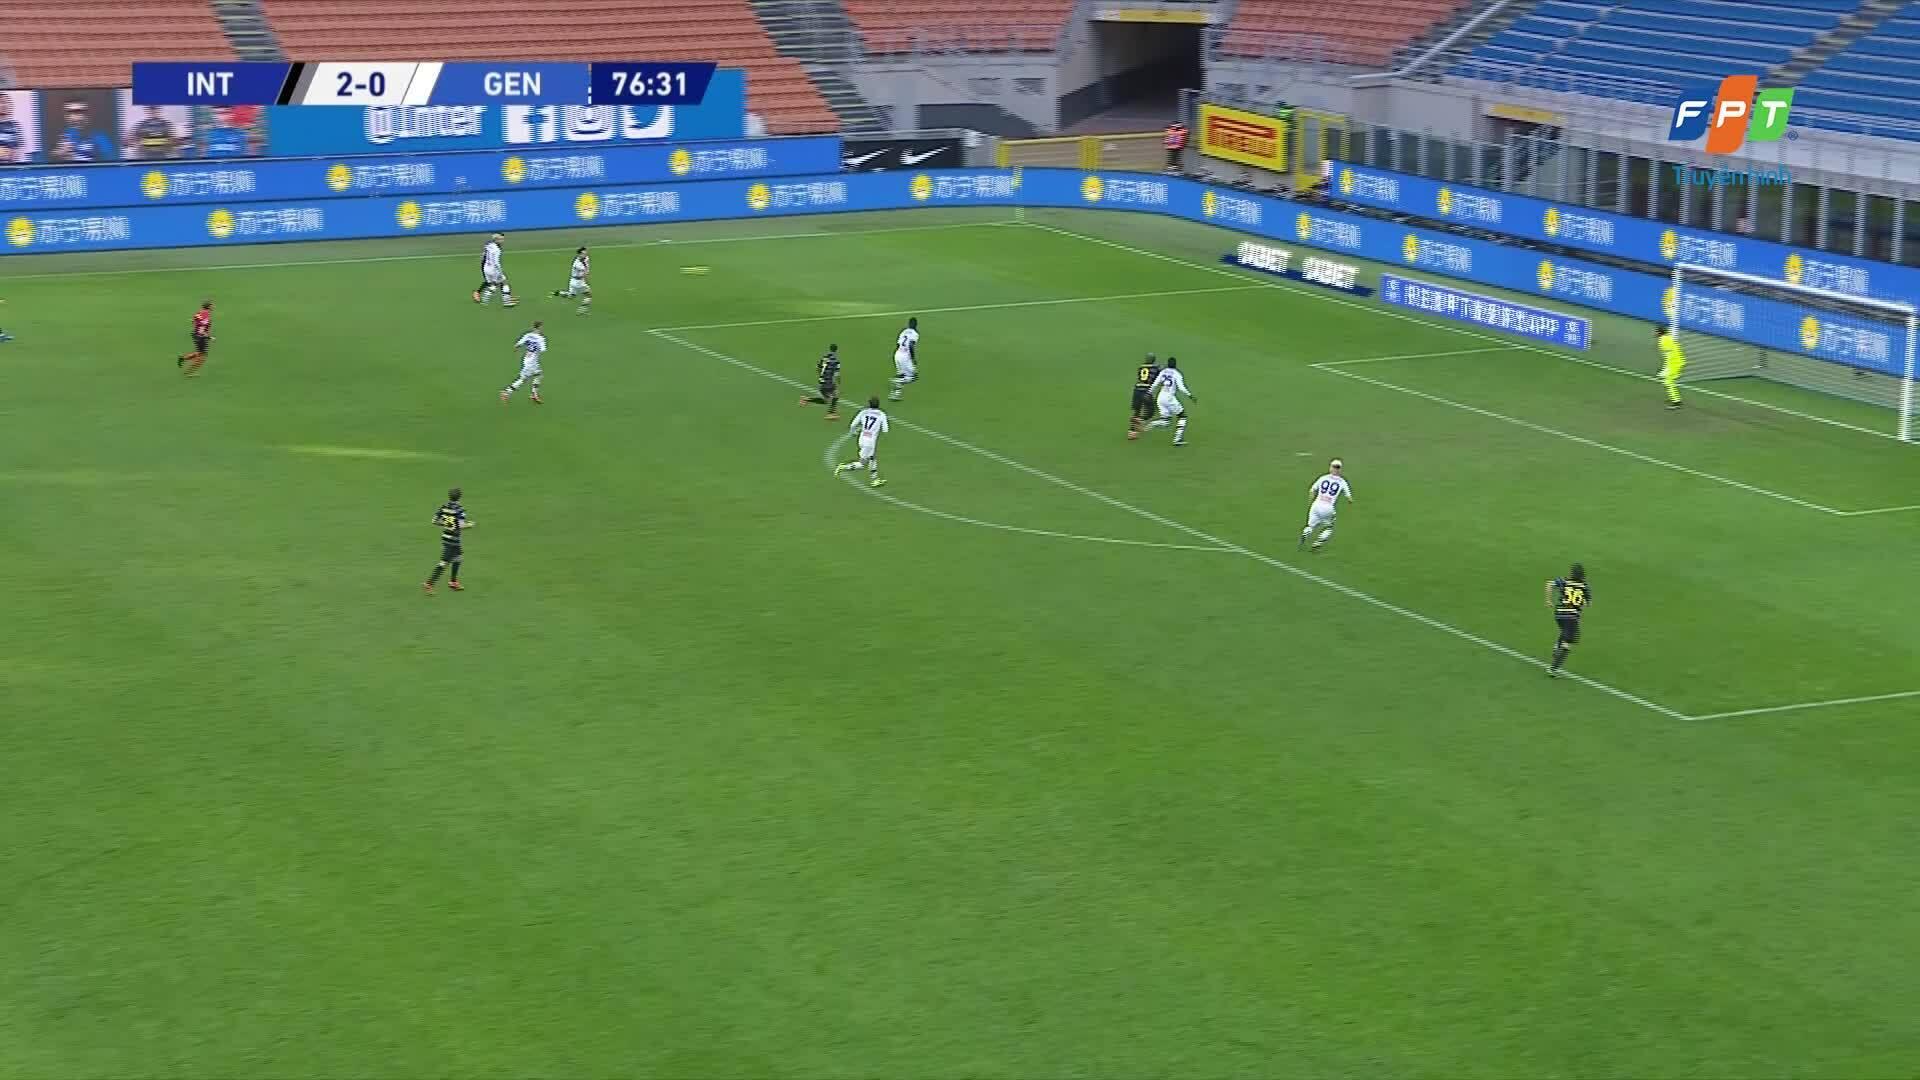 Inter 3-0 Genoa